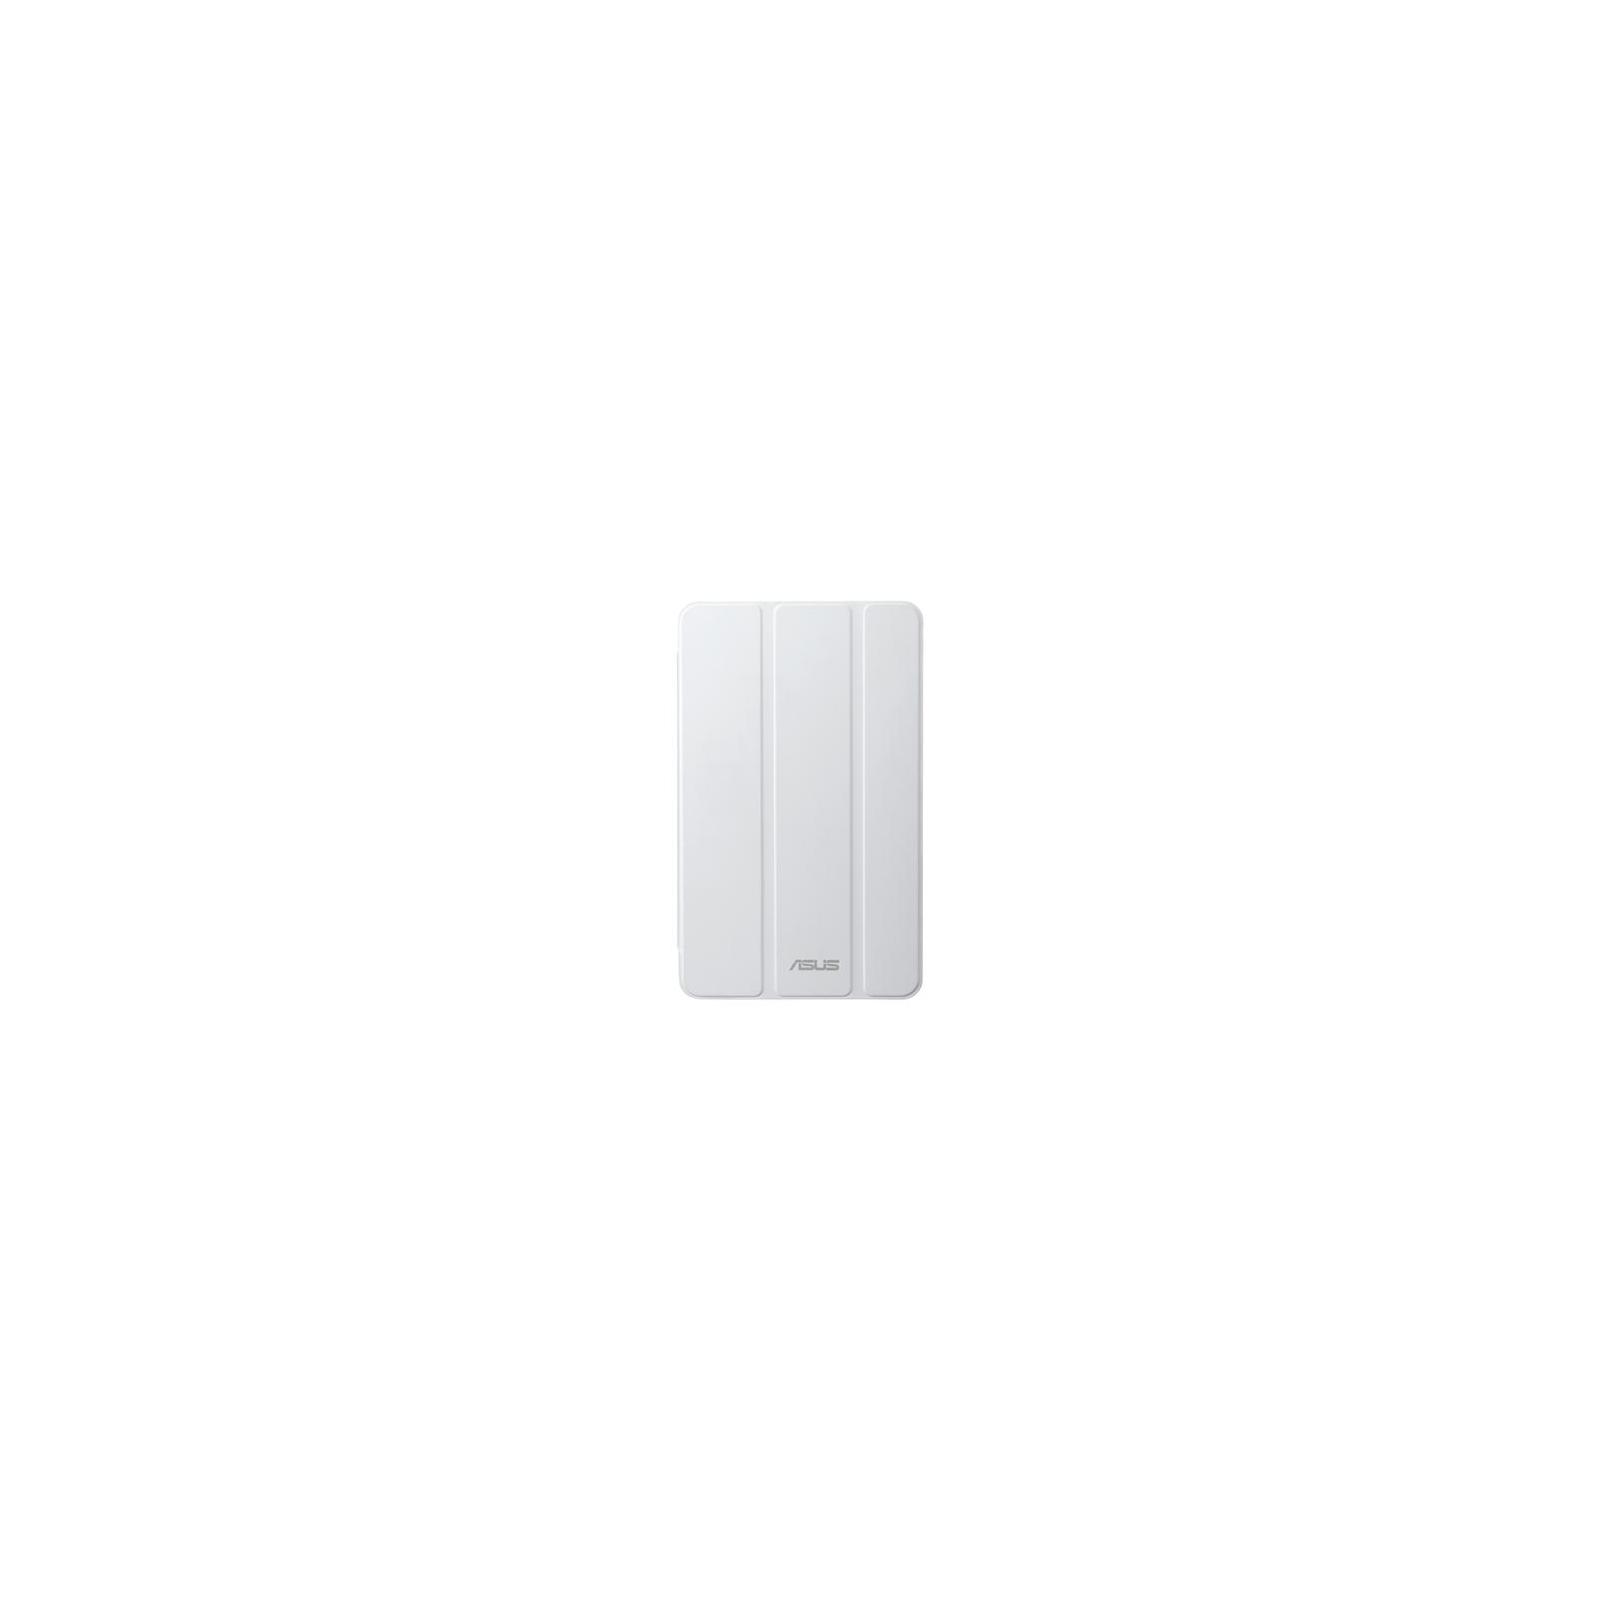 Чехол для планшета ASUS 10 ME102A TriCover WHITE (90XB015P-BSL070)